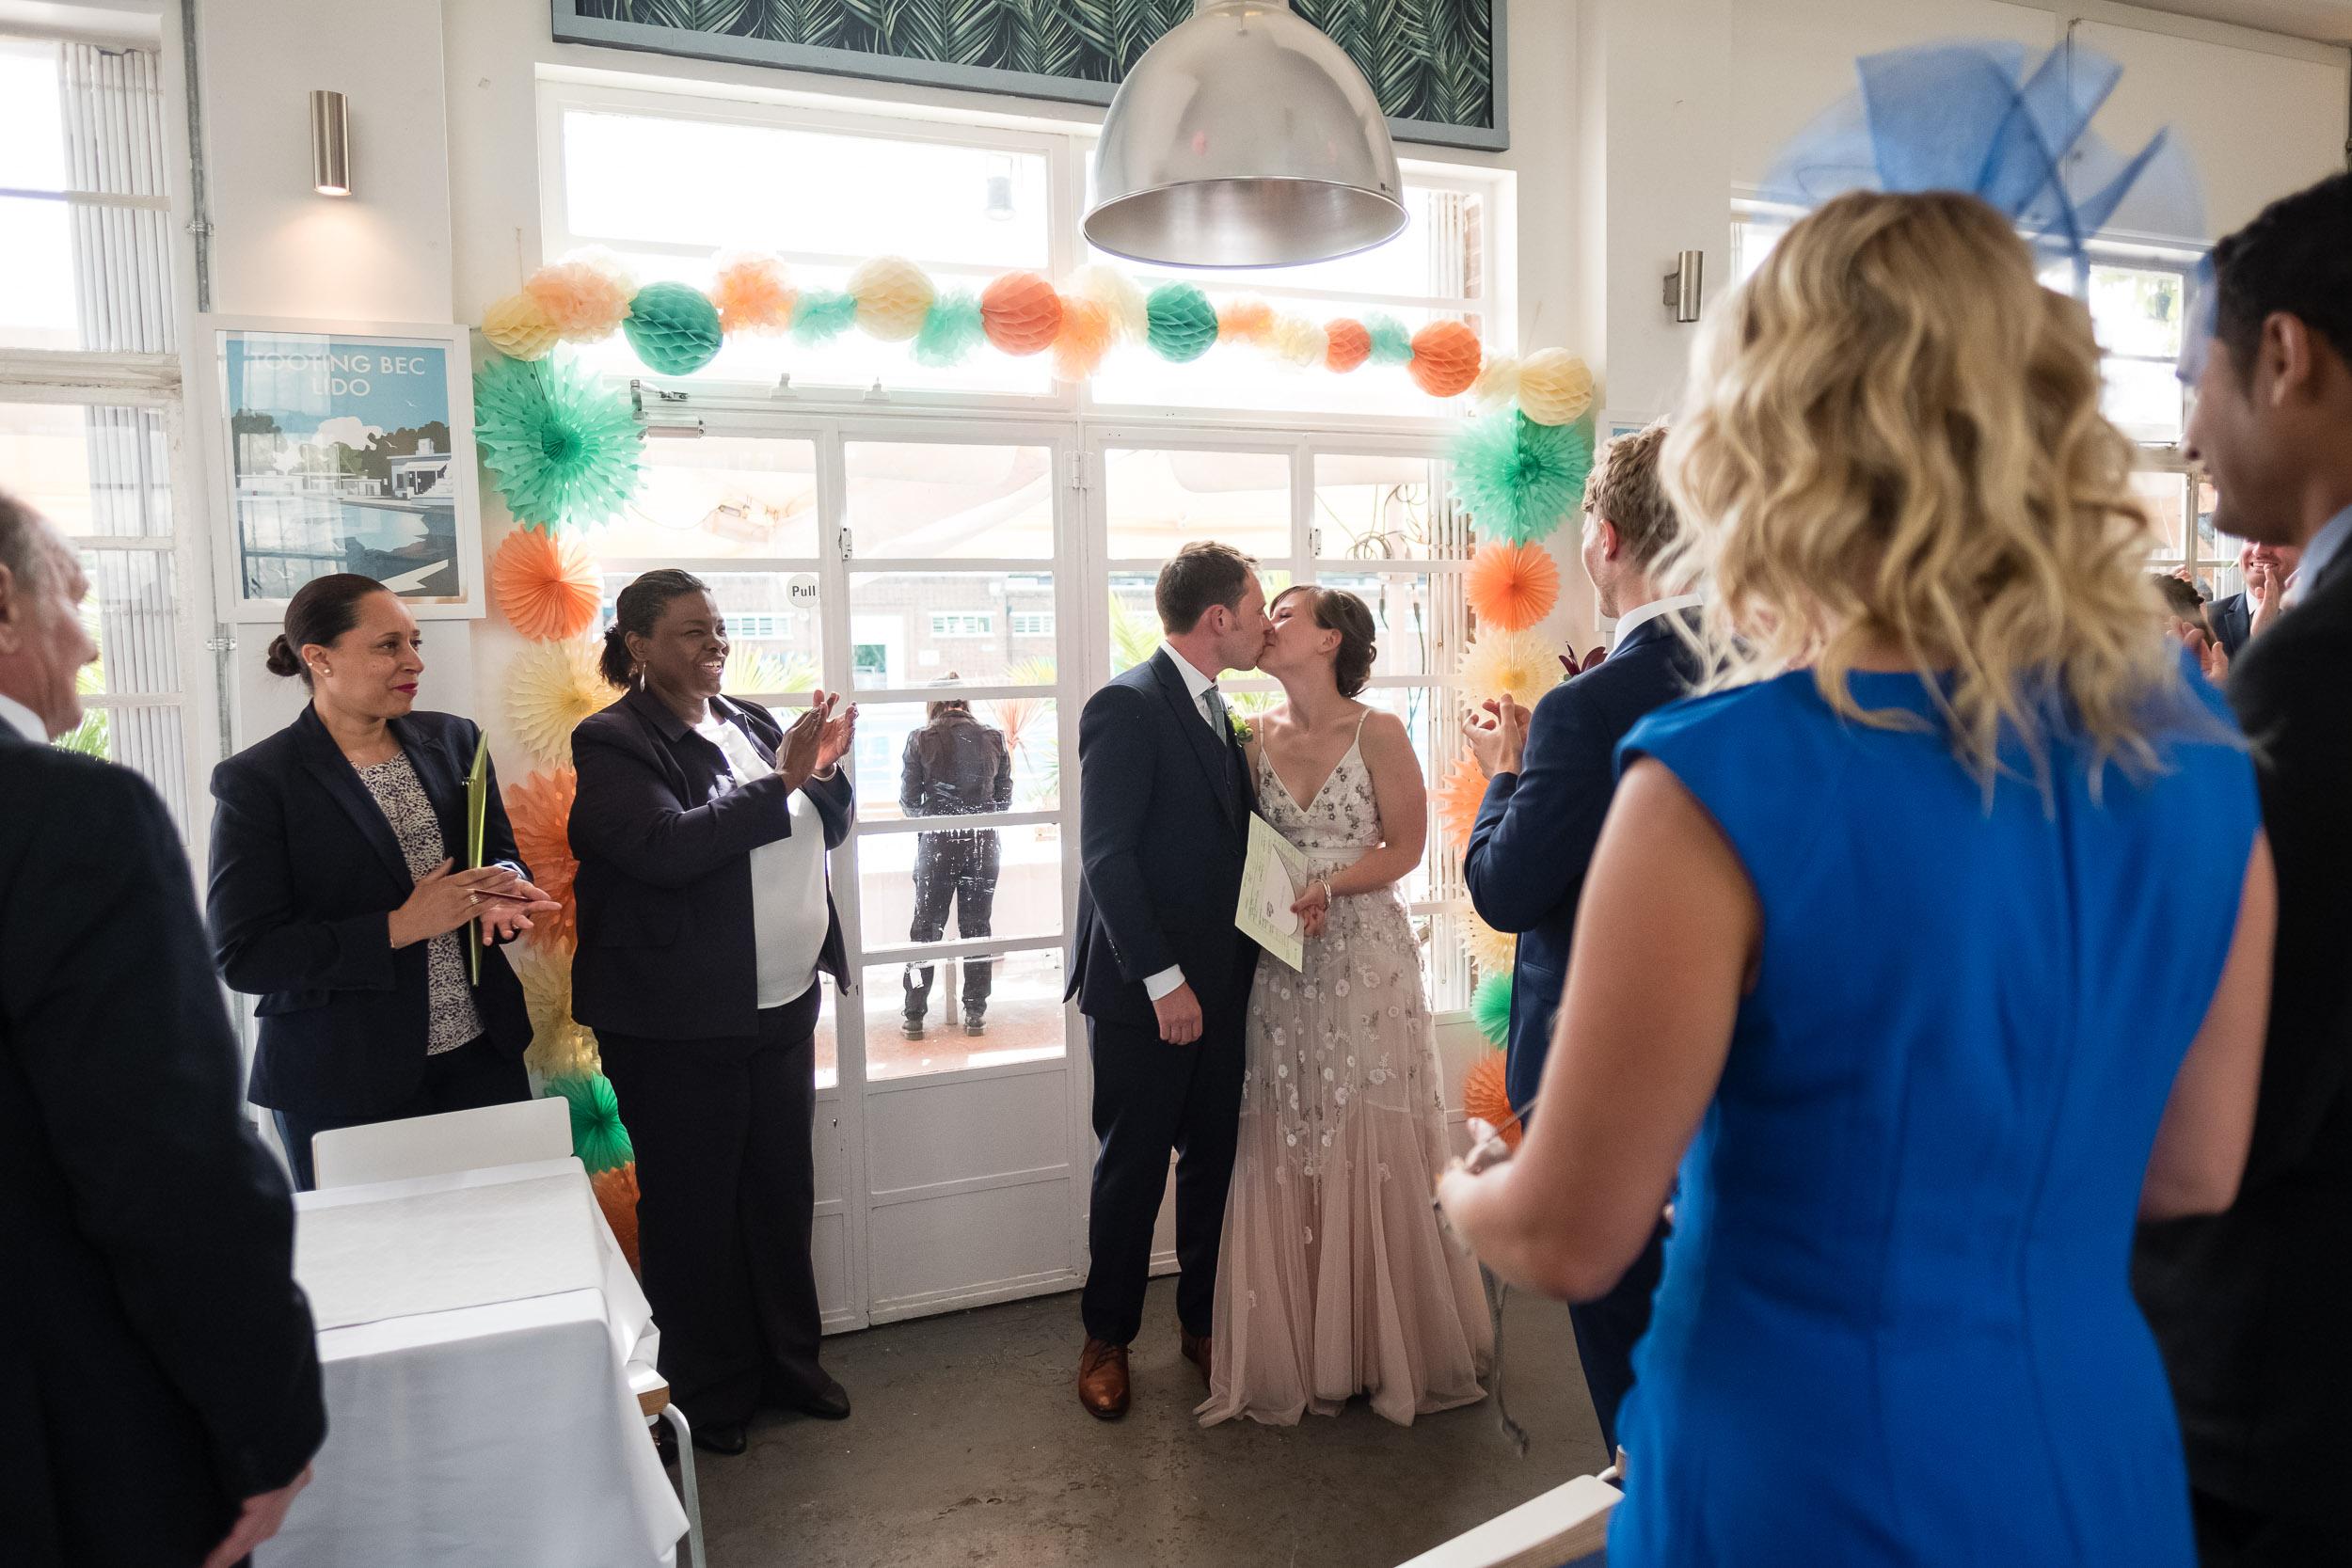 brockwell-lido-brixton-herne-hill-wedding-203.jpg